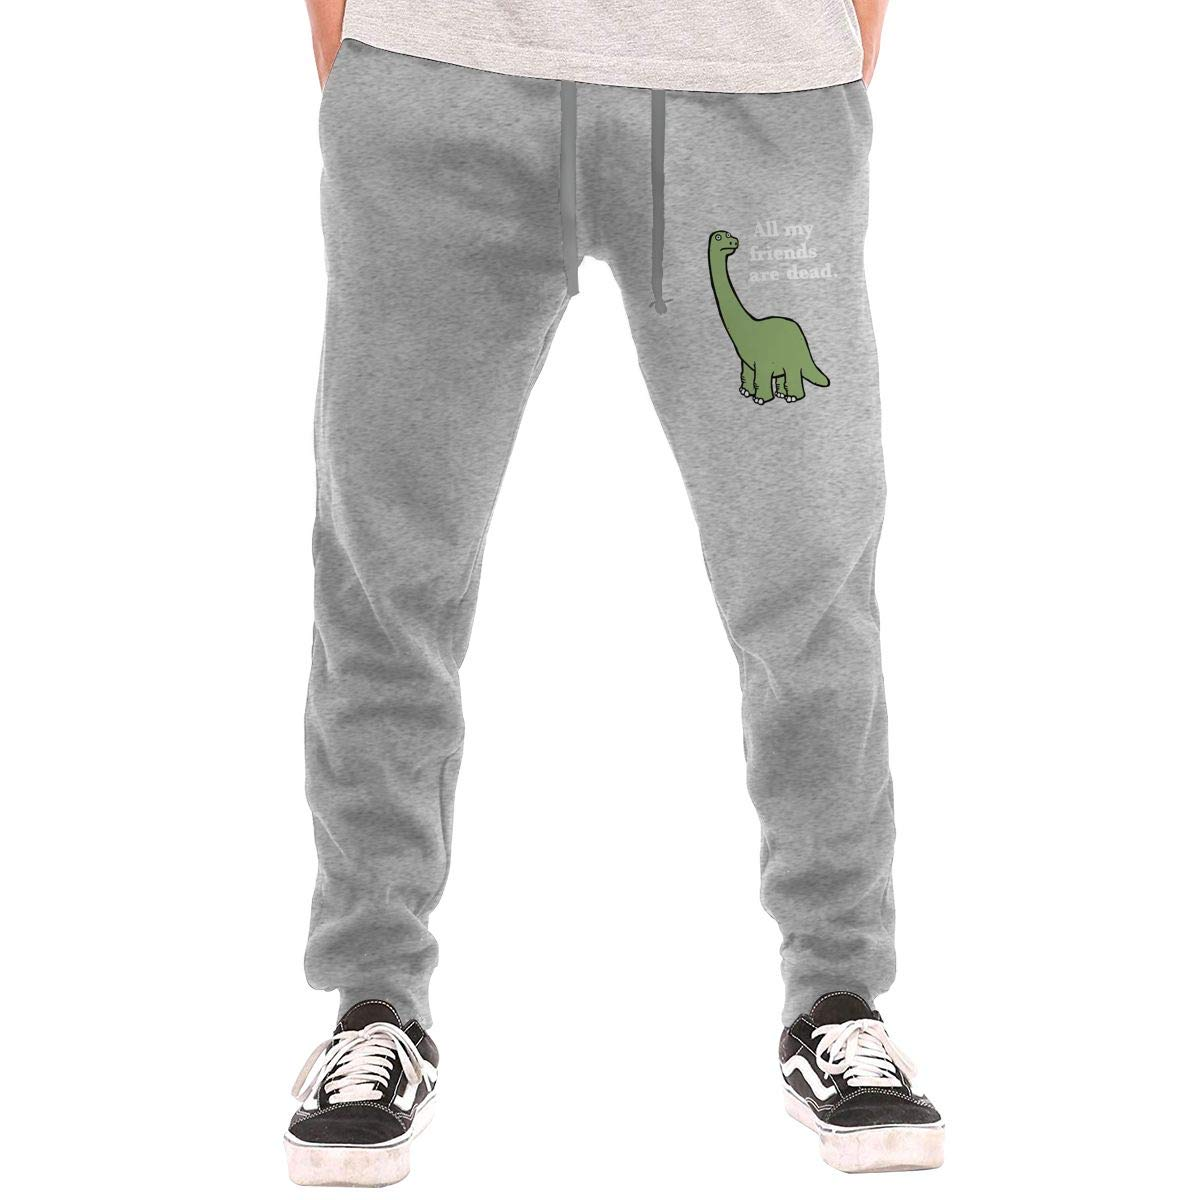 All My Friends are Dead Dinosaur Drawstring Waist,100/% Cotton,Elastic Waist Cuffed,Jogger Sweatpants